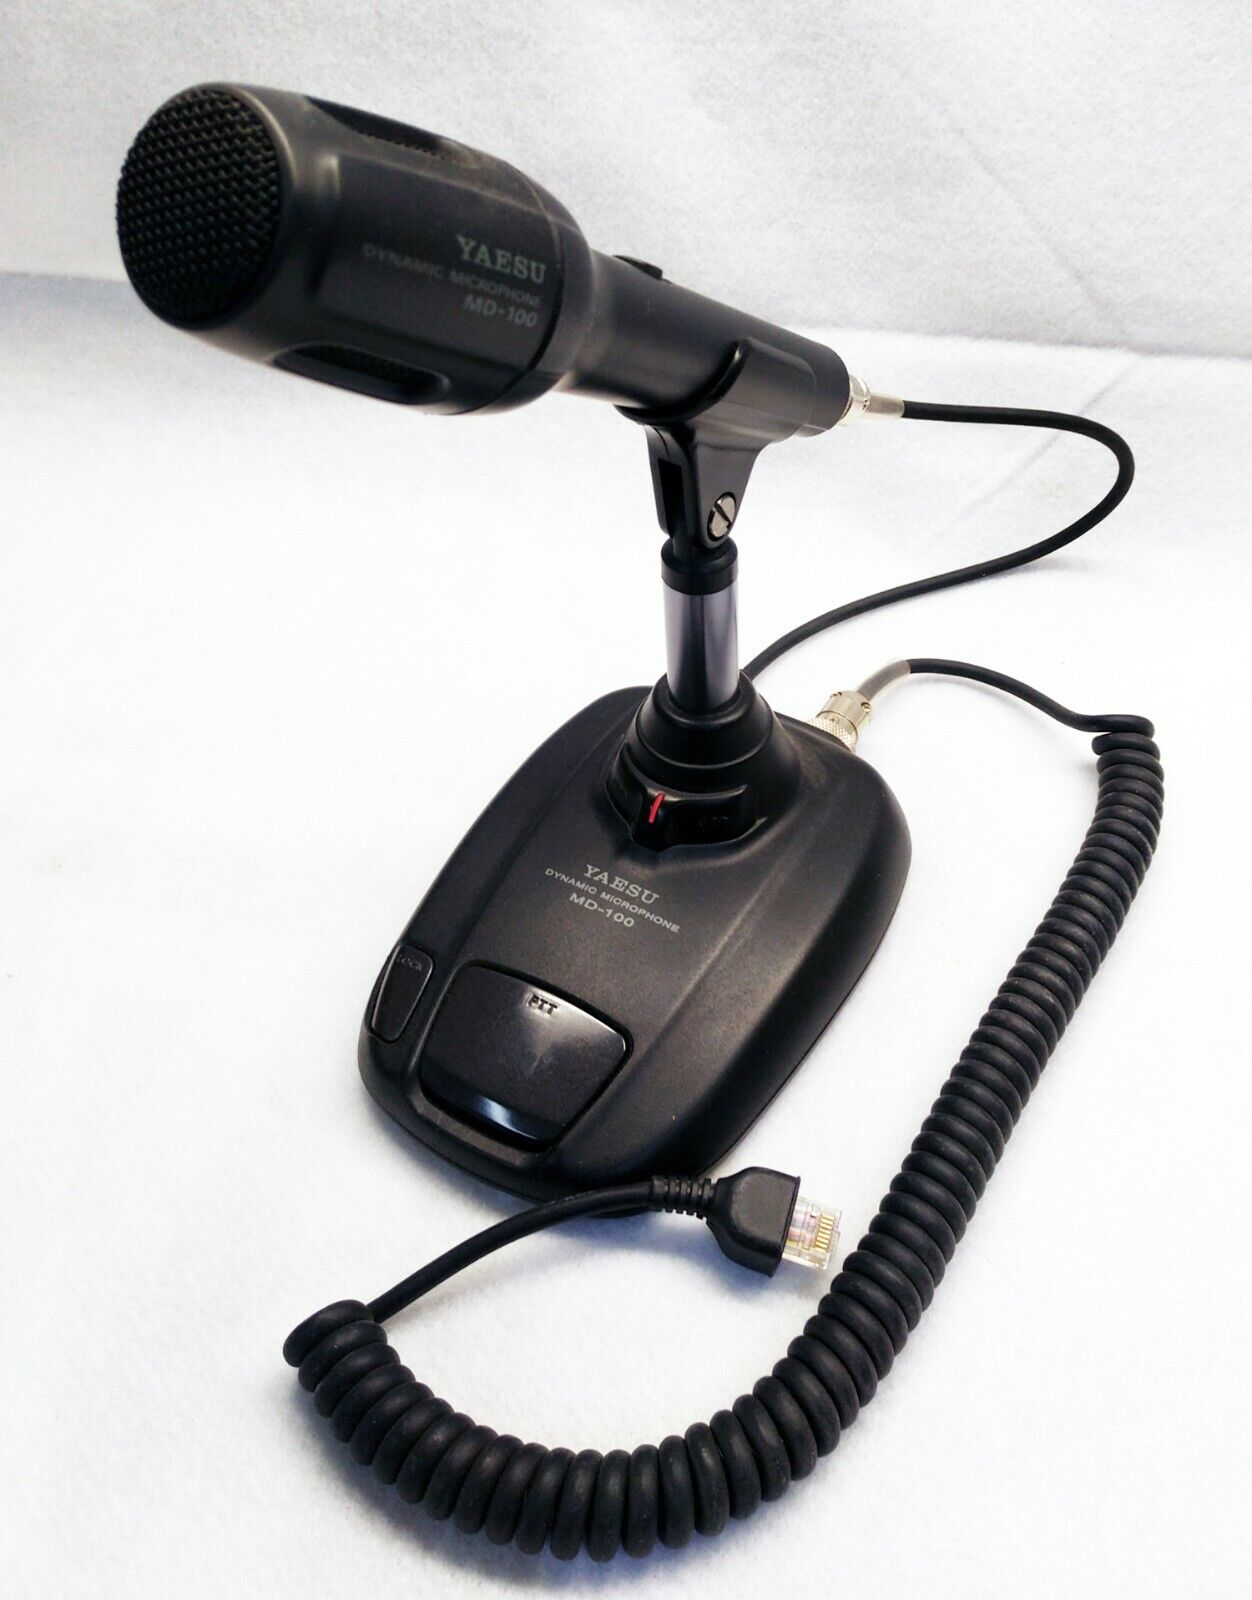 Yaesu MD-100A8X Dynamic Desk Microphone. Buy it now for 200.00